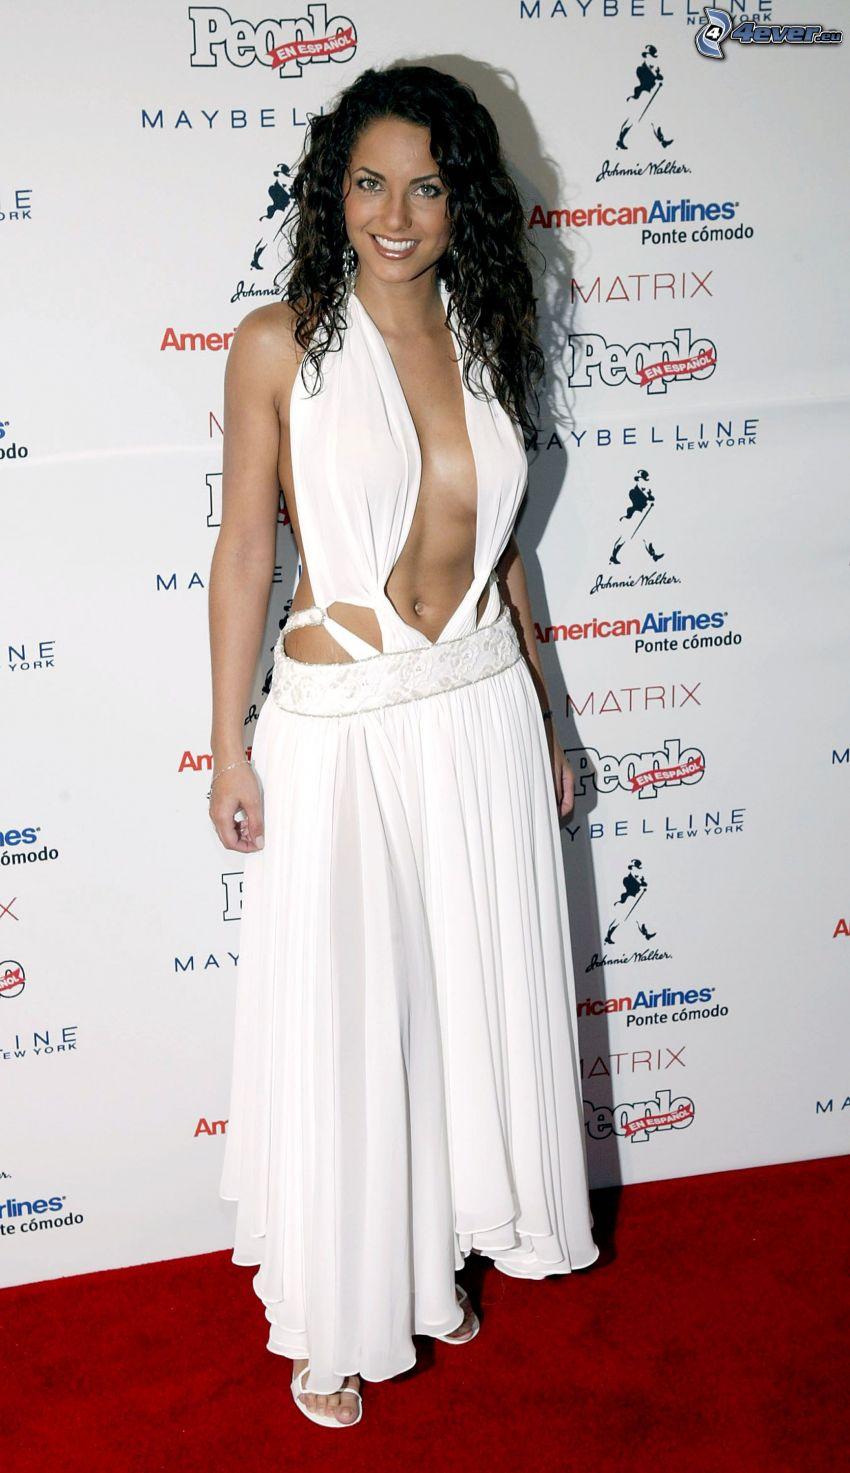 Barbara Mori, biała sukienka, bez biustonosza